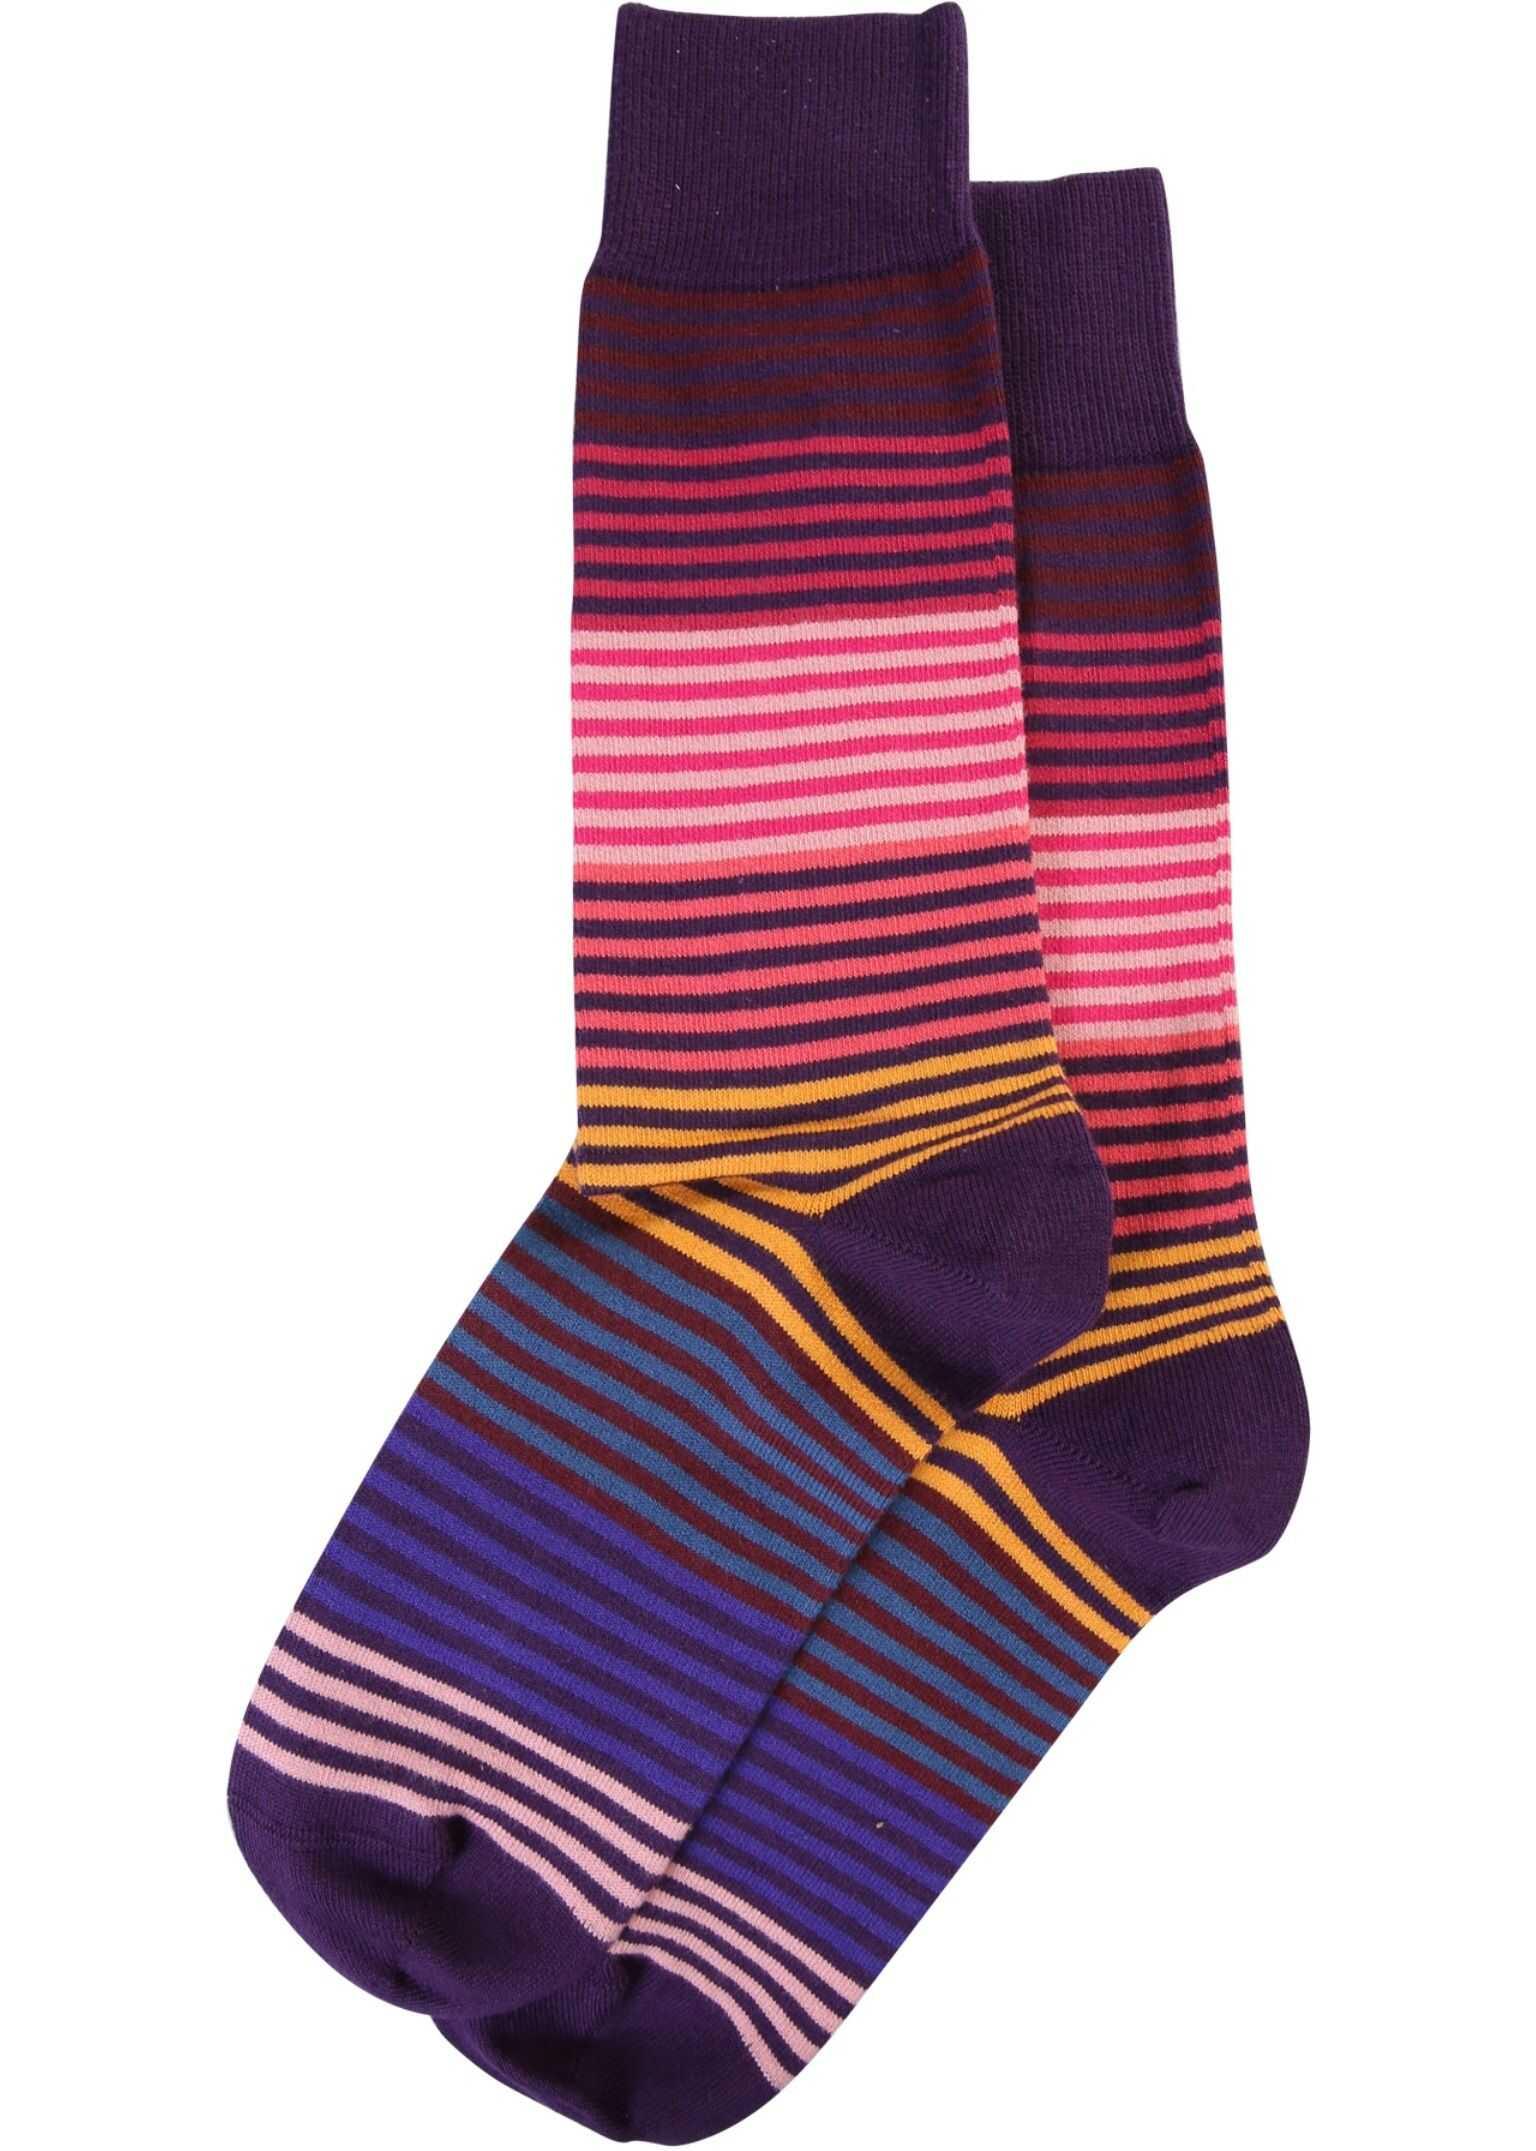 Paul Smith Striped Socks PURPLE imagine